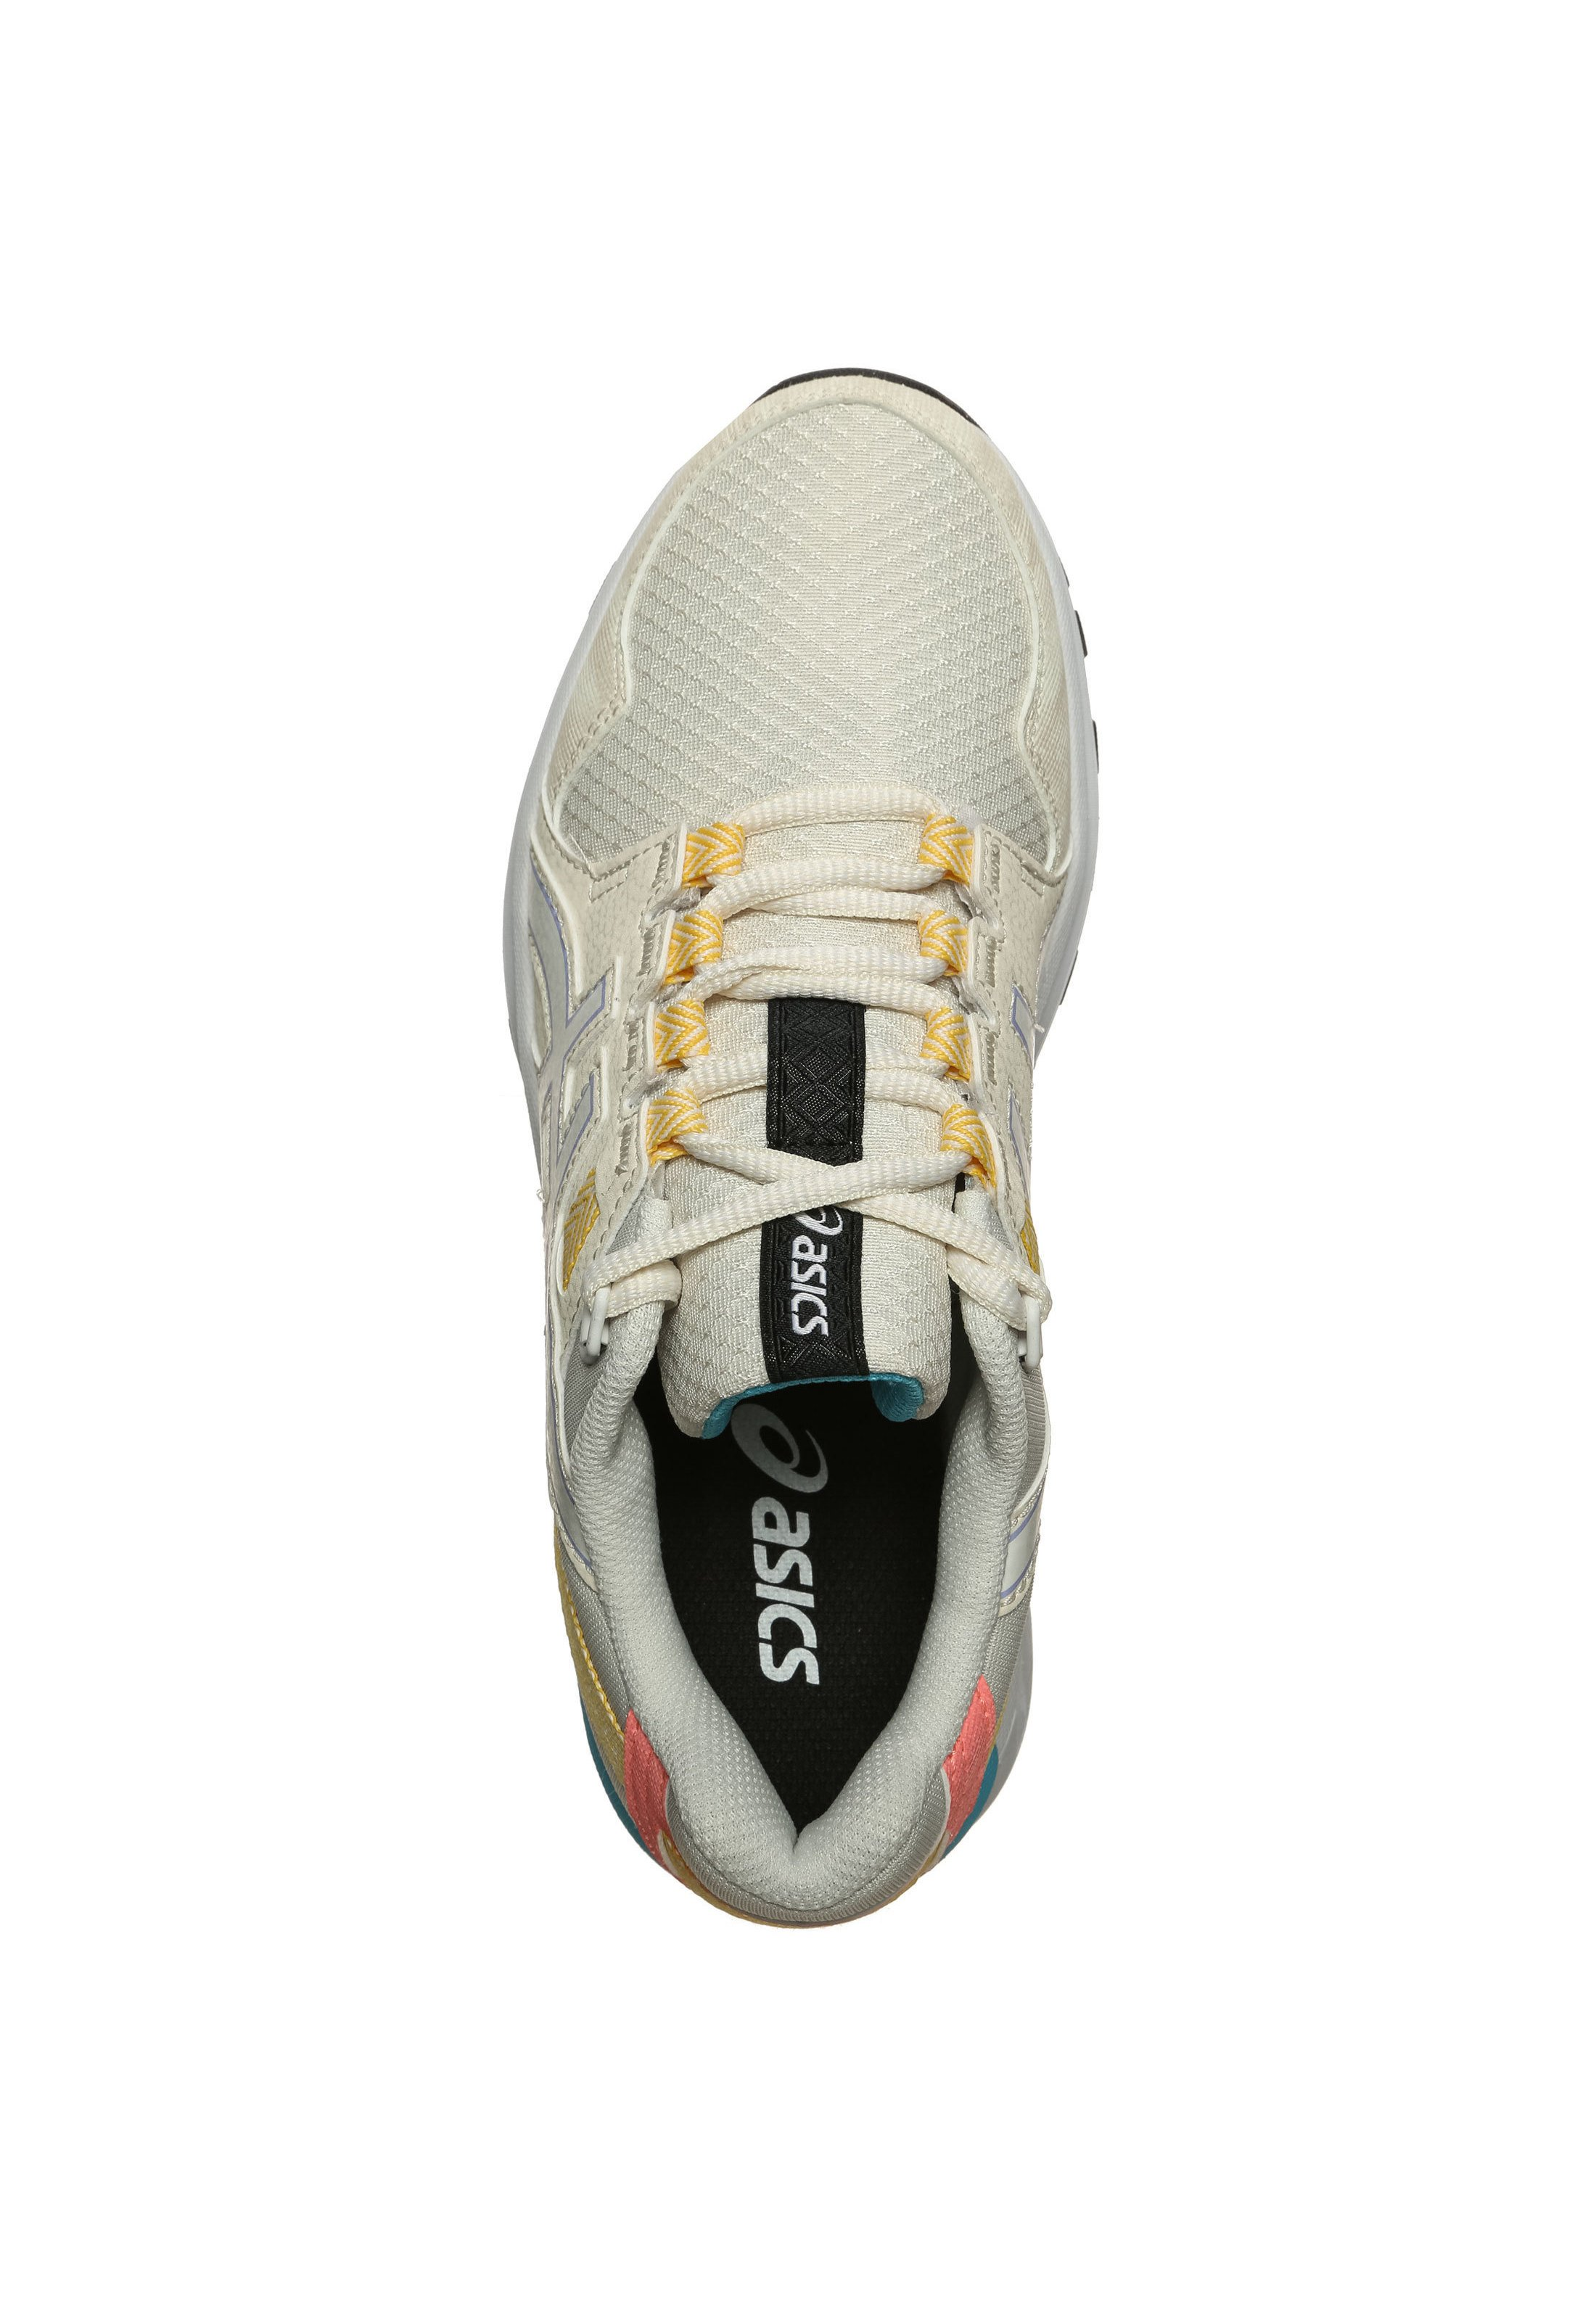 GEL-CITREK LAUFSCHUH DAMEN - Sneaker low - cream / white